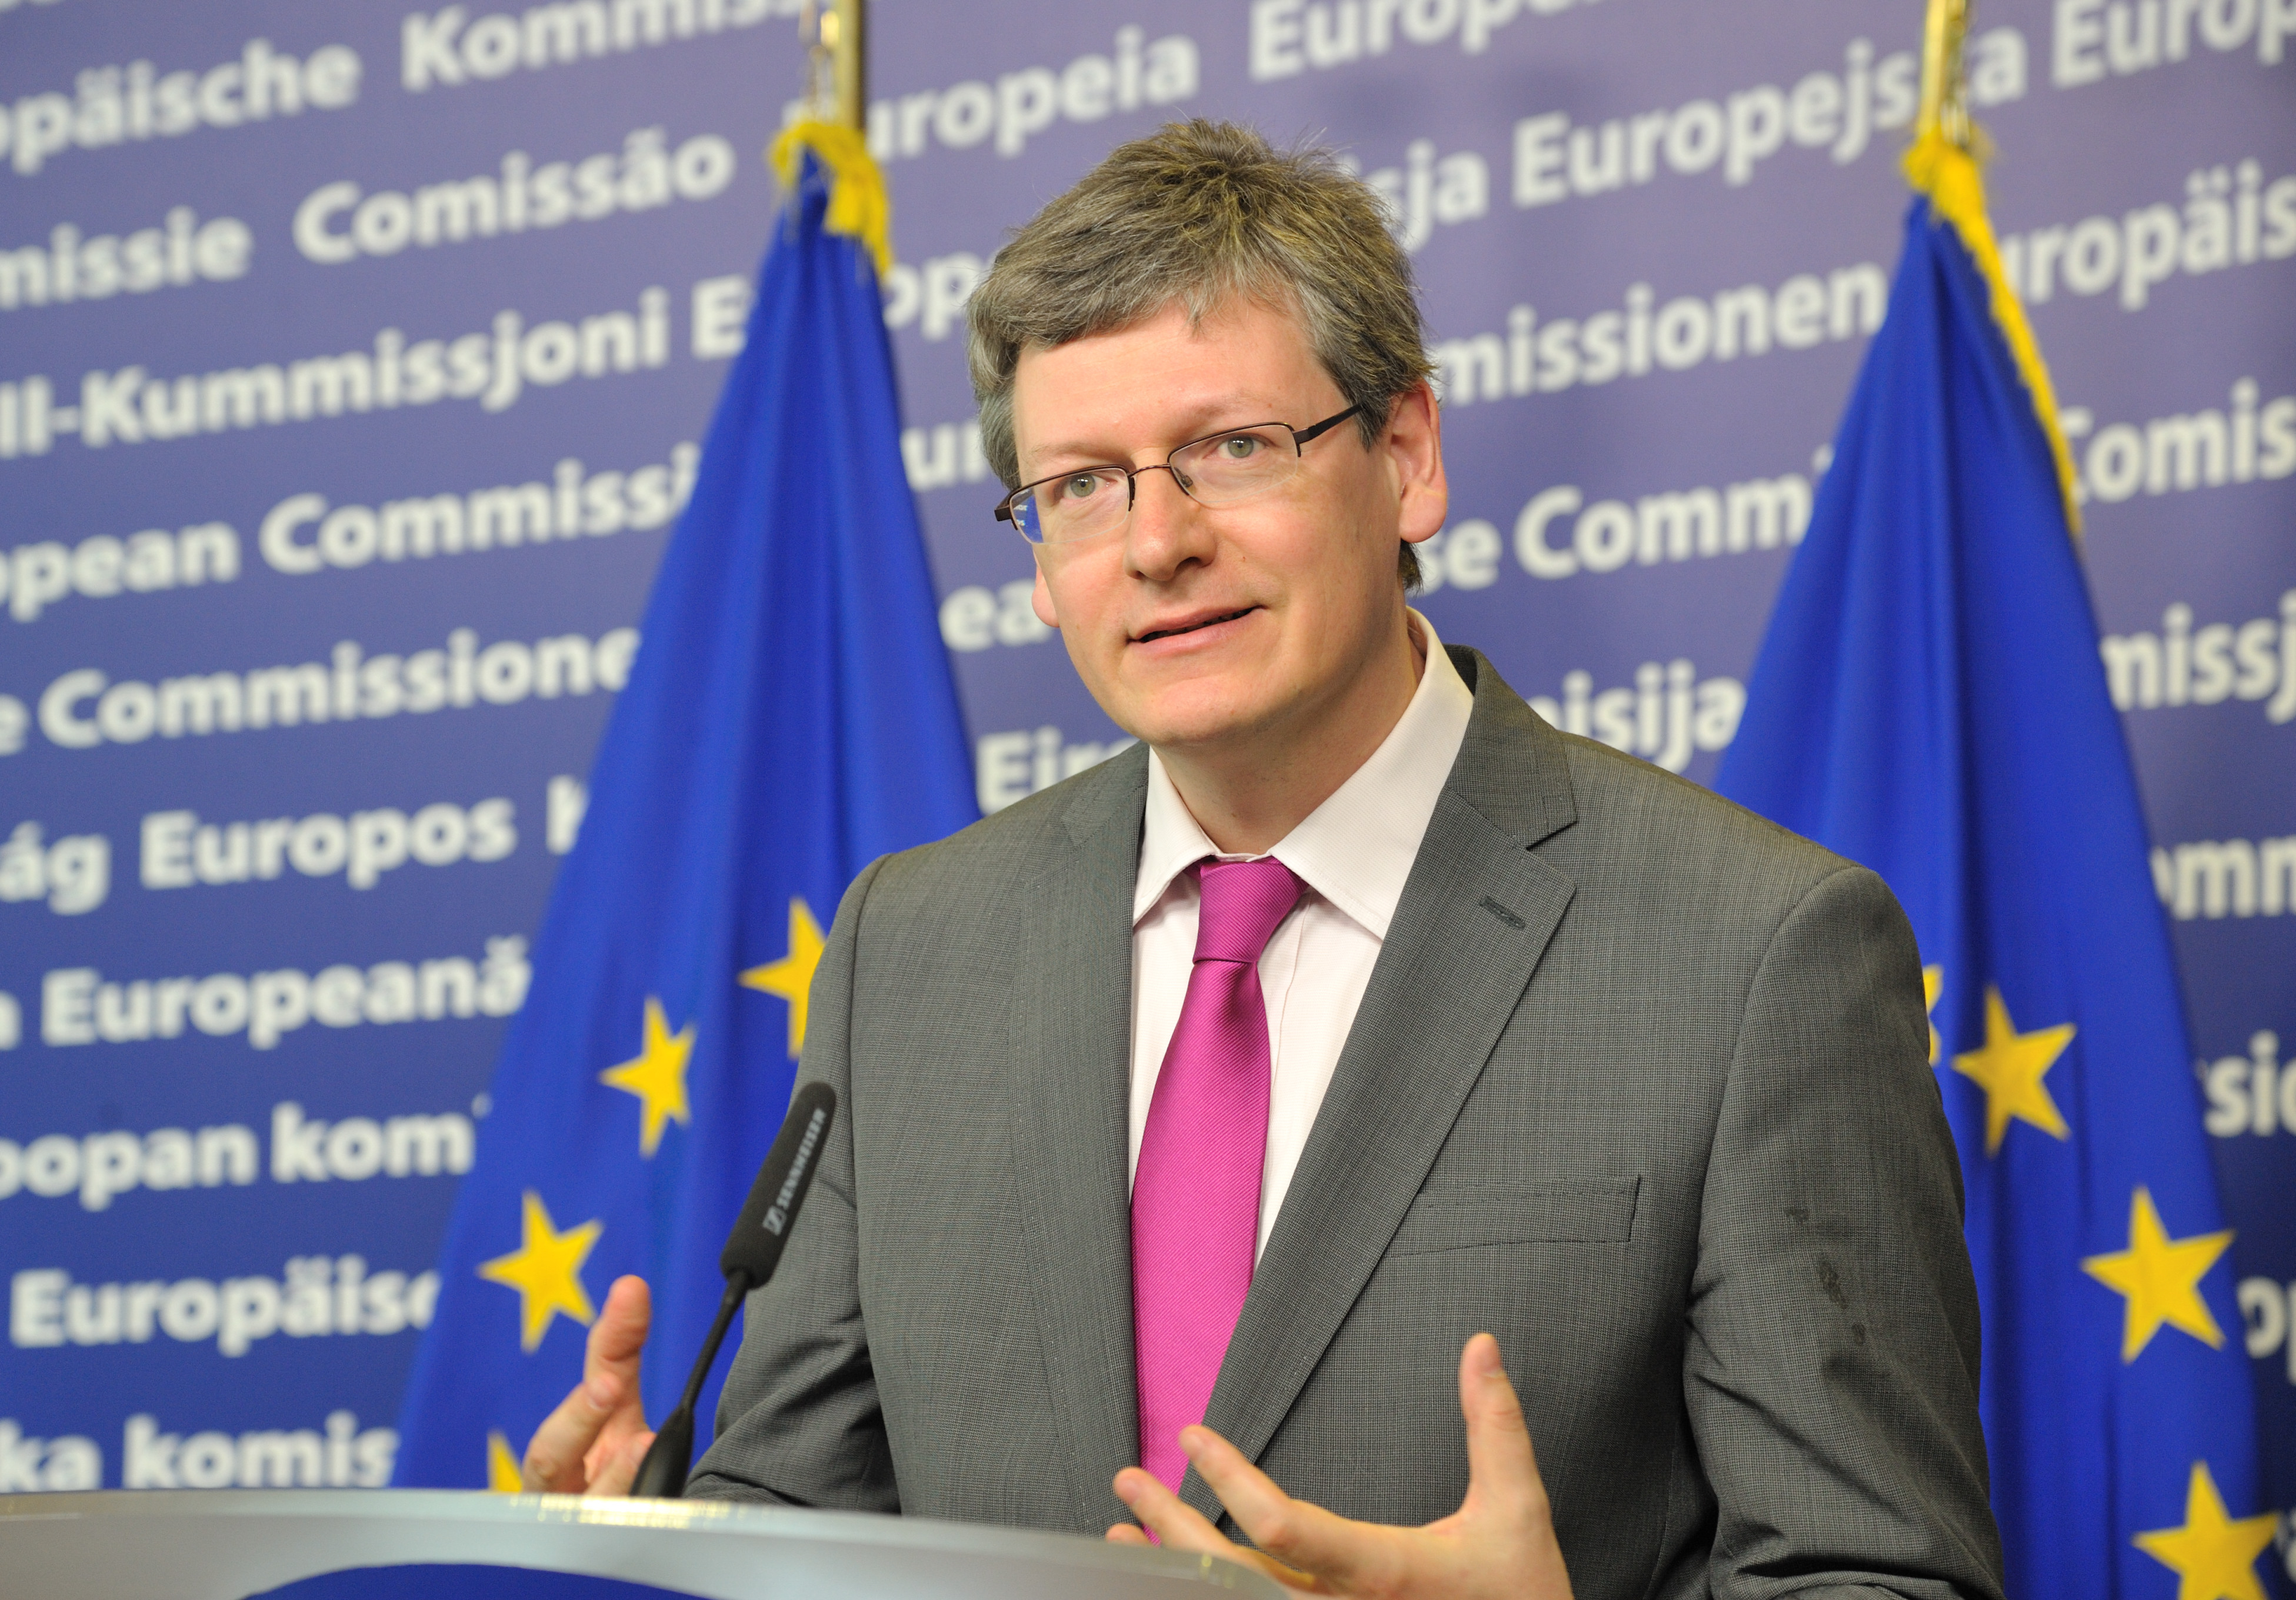 Lázló Andor Foto: Europäische Kommission/Union